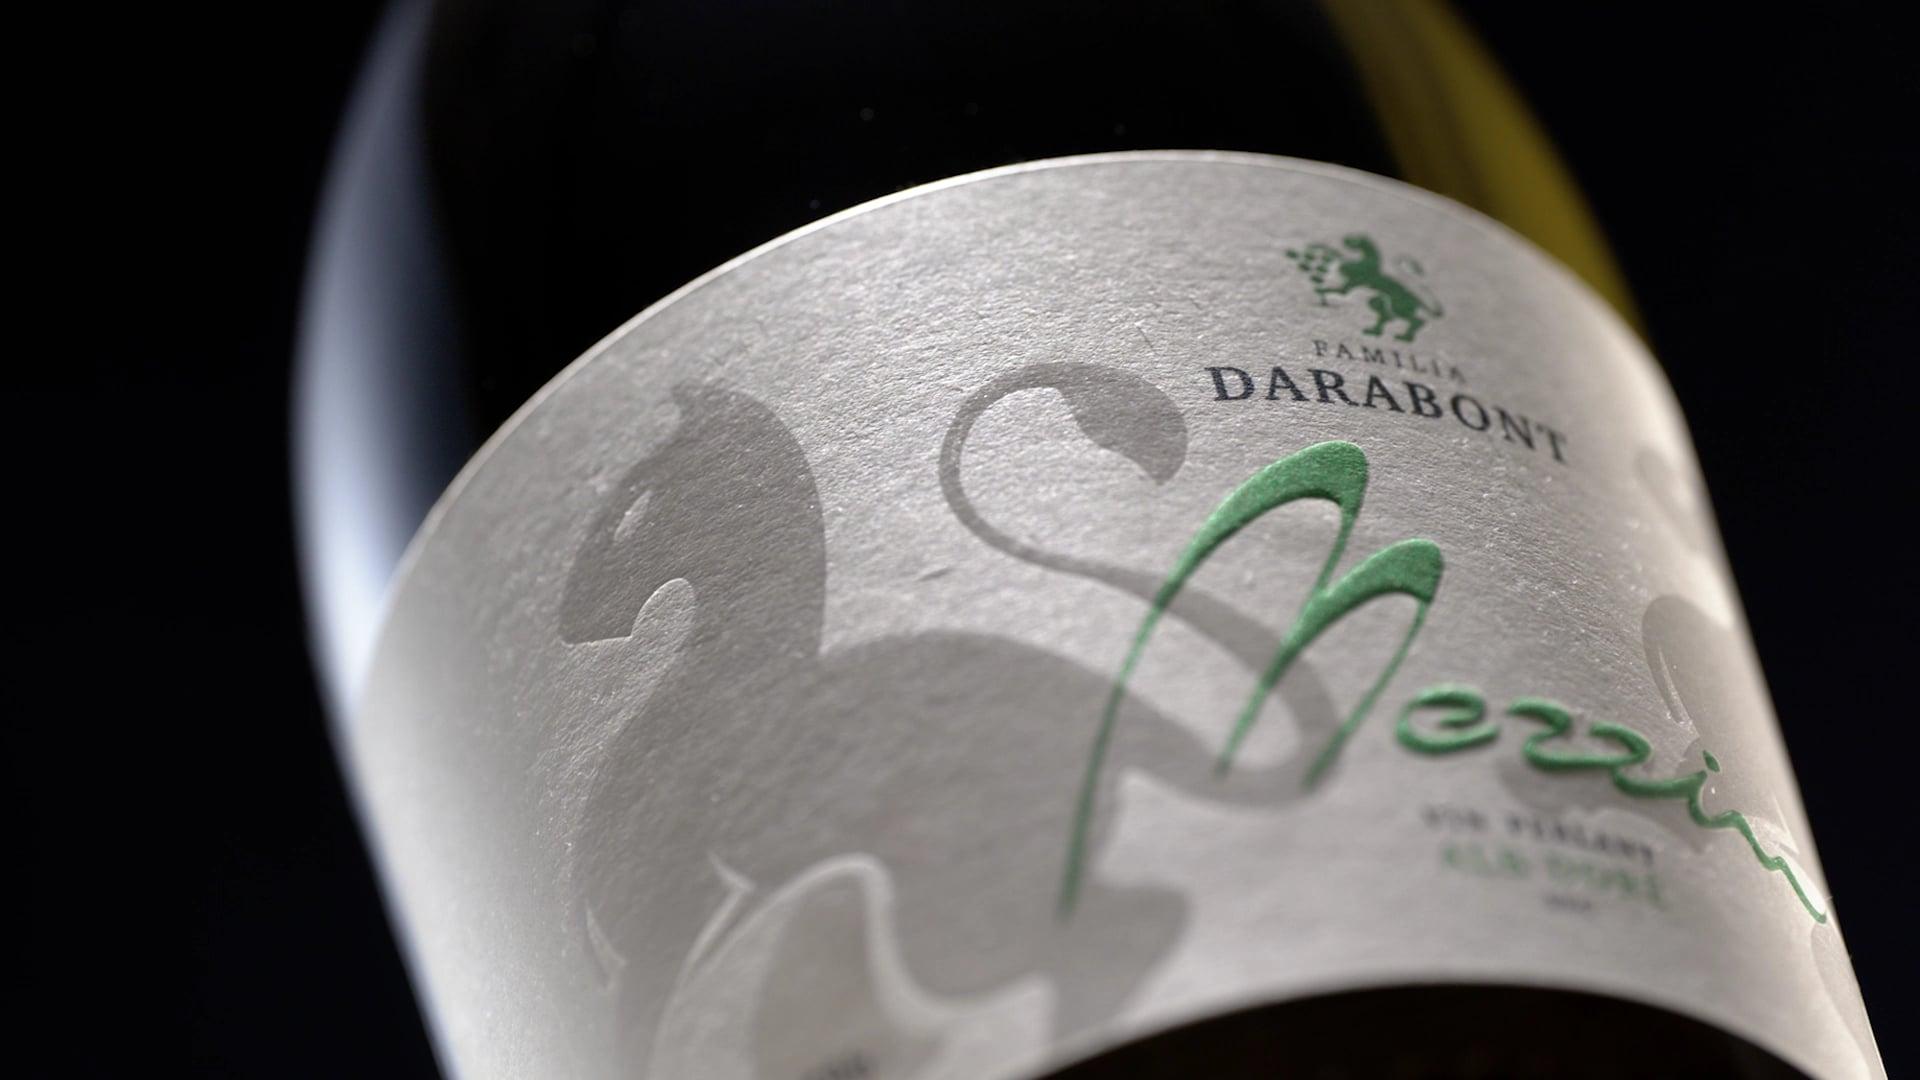 Darabont (Vin Perlant) promo